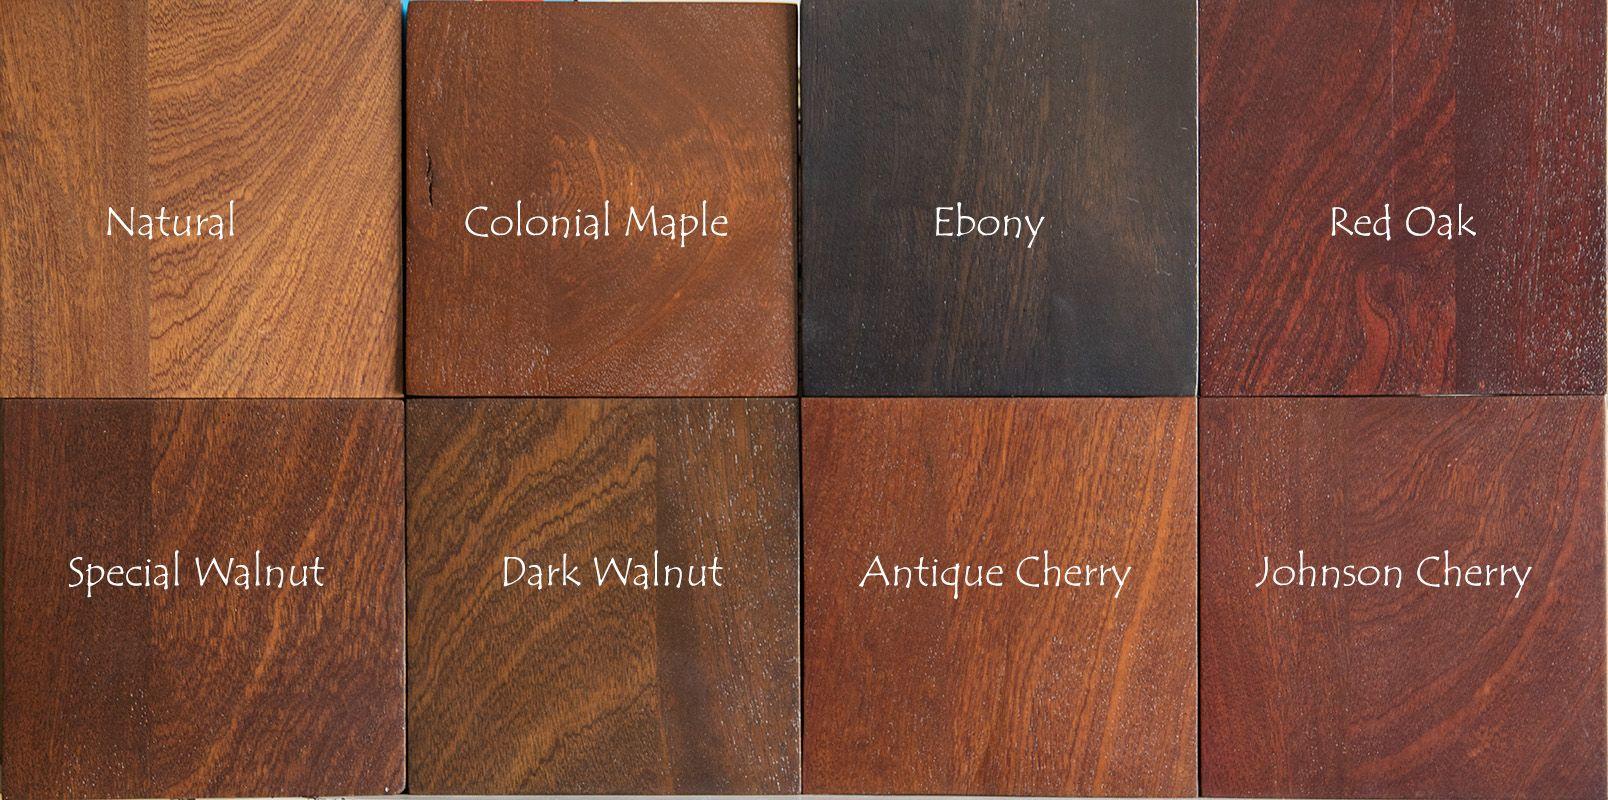 Sapele Mahogany Stain Samples Mahogany Stain Staining Wood Wood Doors